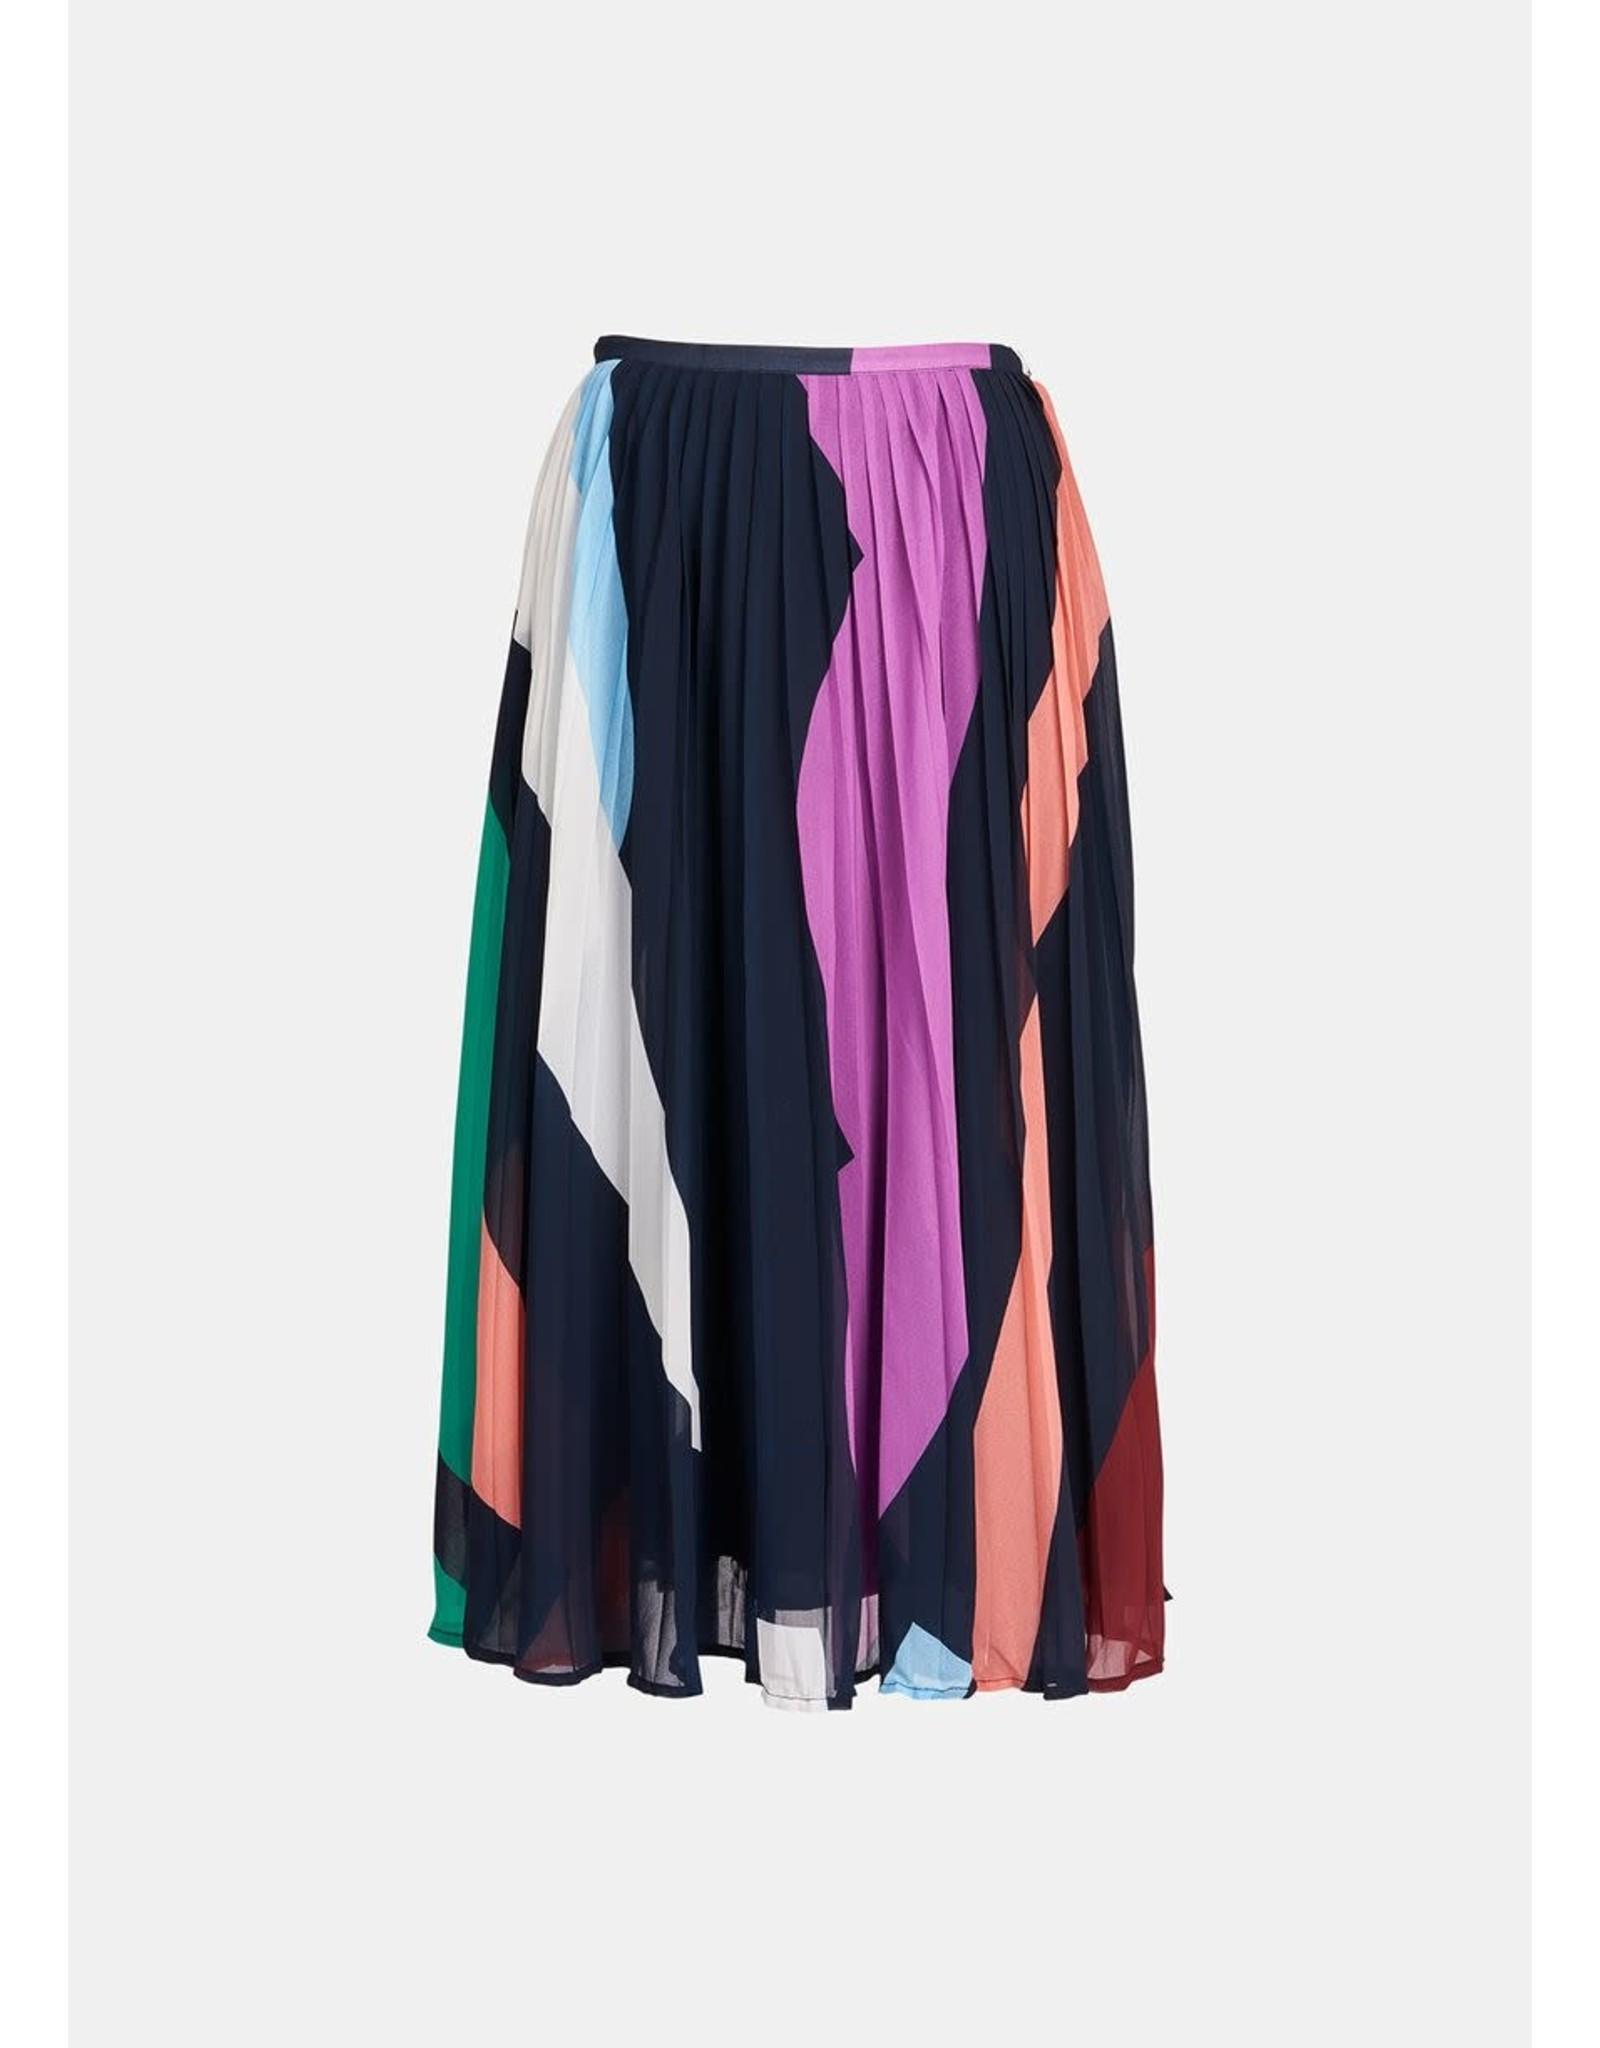 Essentiel Zalerie Pleat Skirt